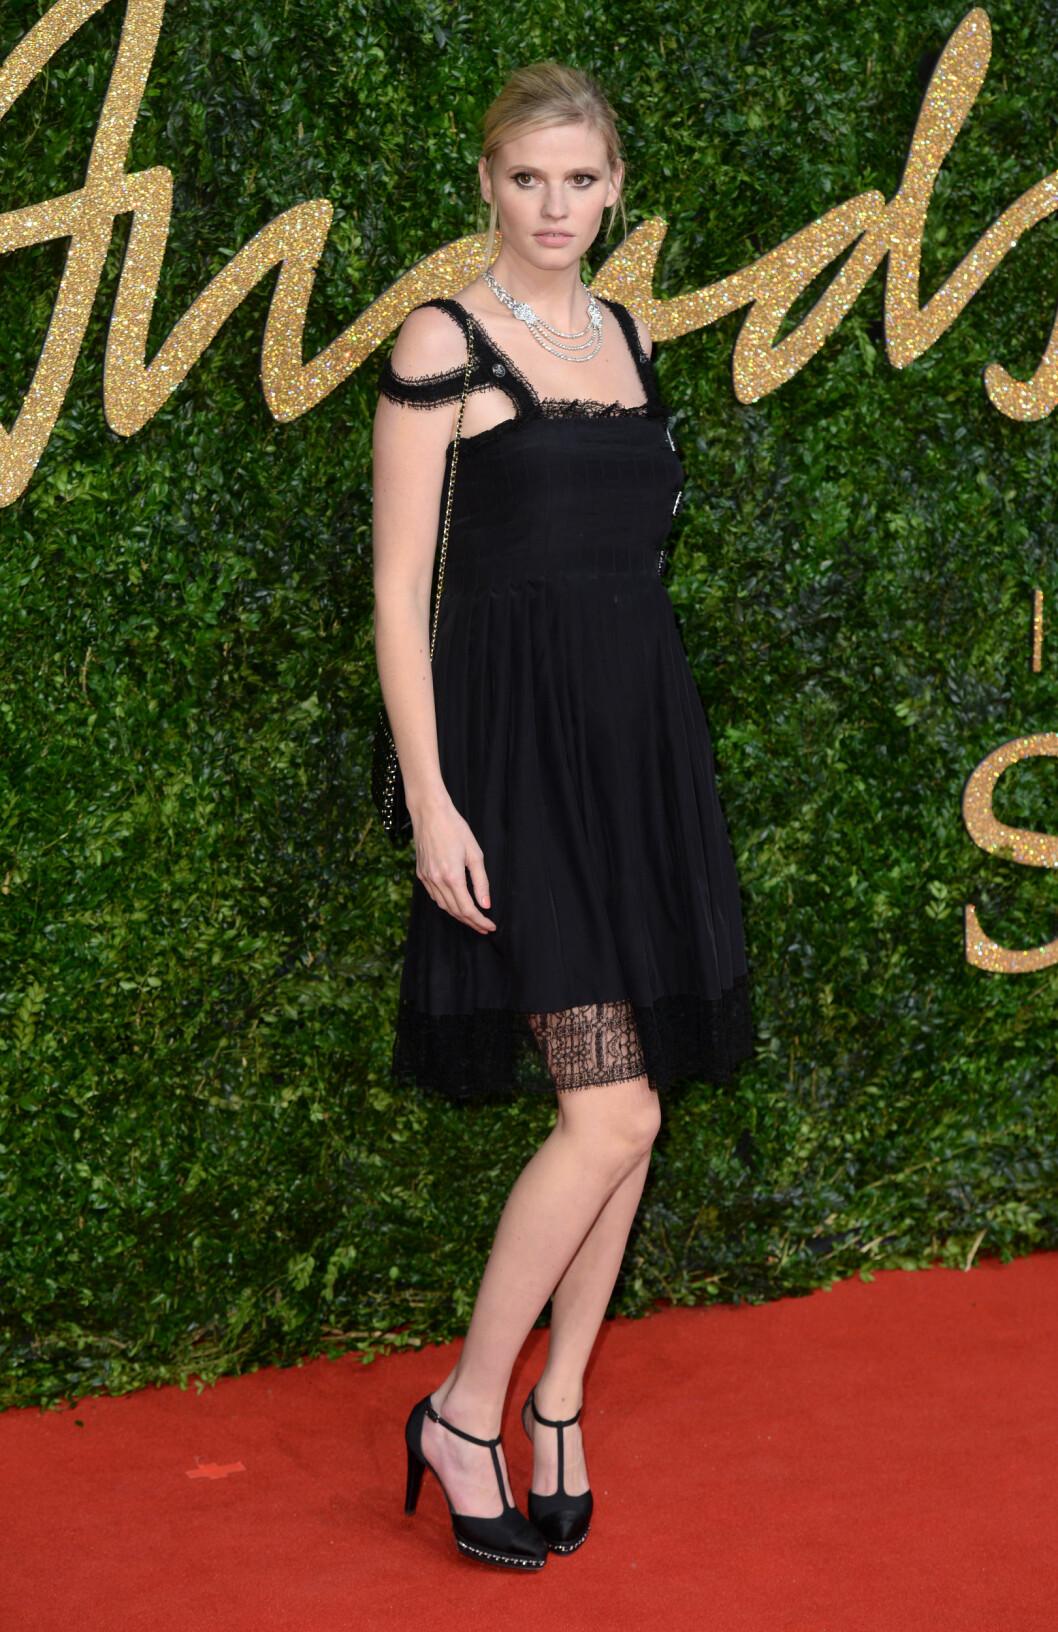 <strong>KULE DETALJER:</strong> Supermodell Lara Stone i en sort minikjole med doble stropper, stylet med pumps med naglesåler og et oversized smykke. Foto: Pa Photos